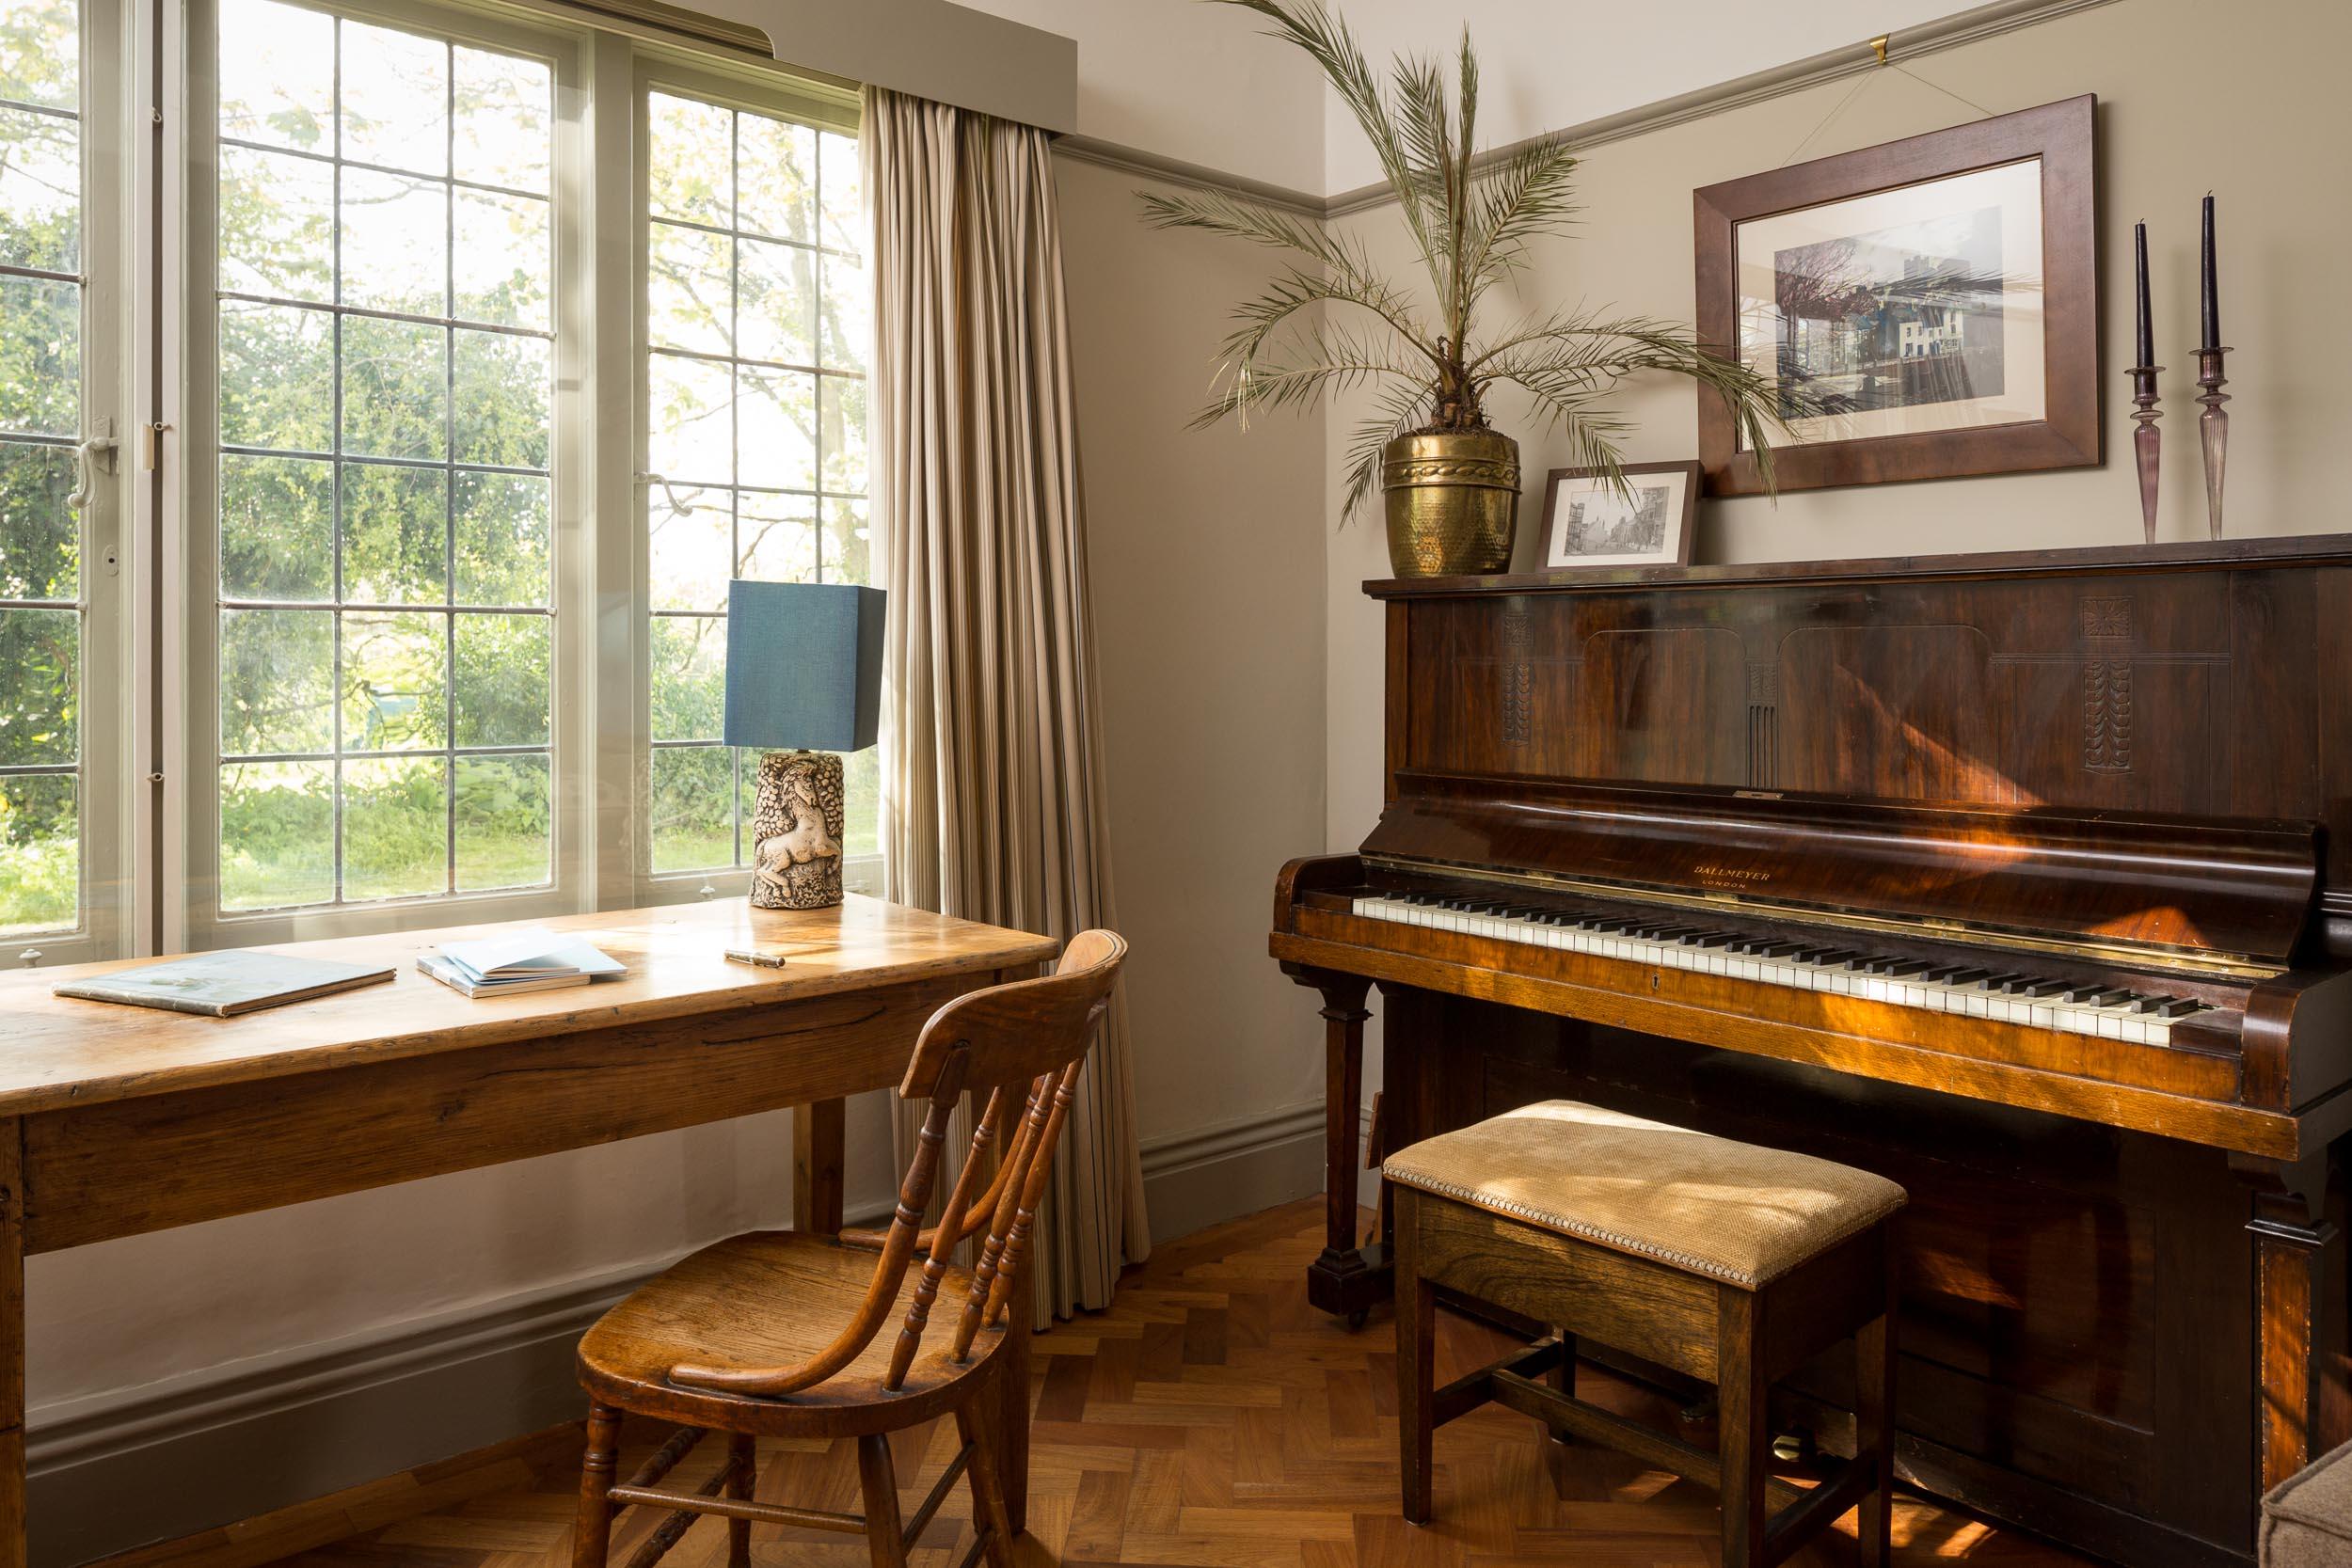 interior design study detail piano desk rustic wood leeds.jpg